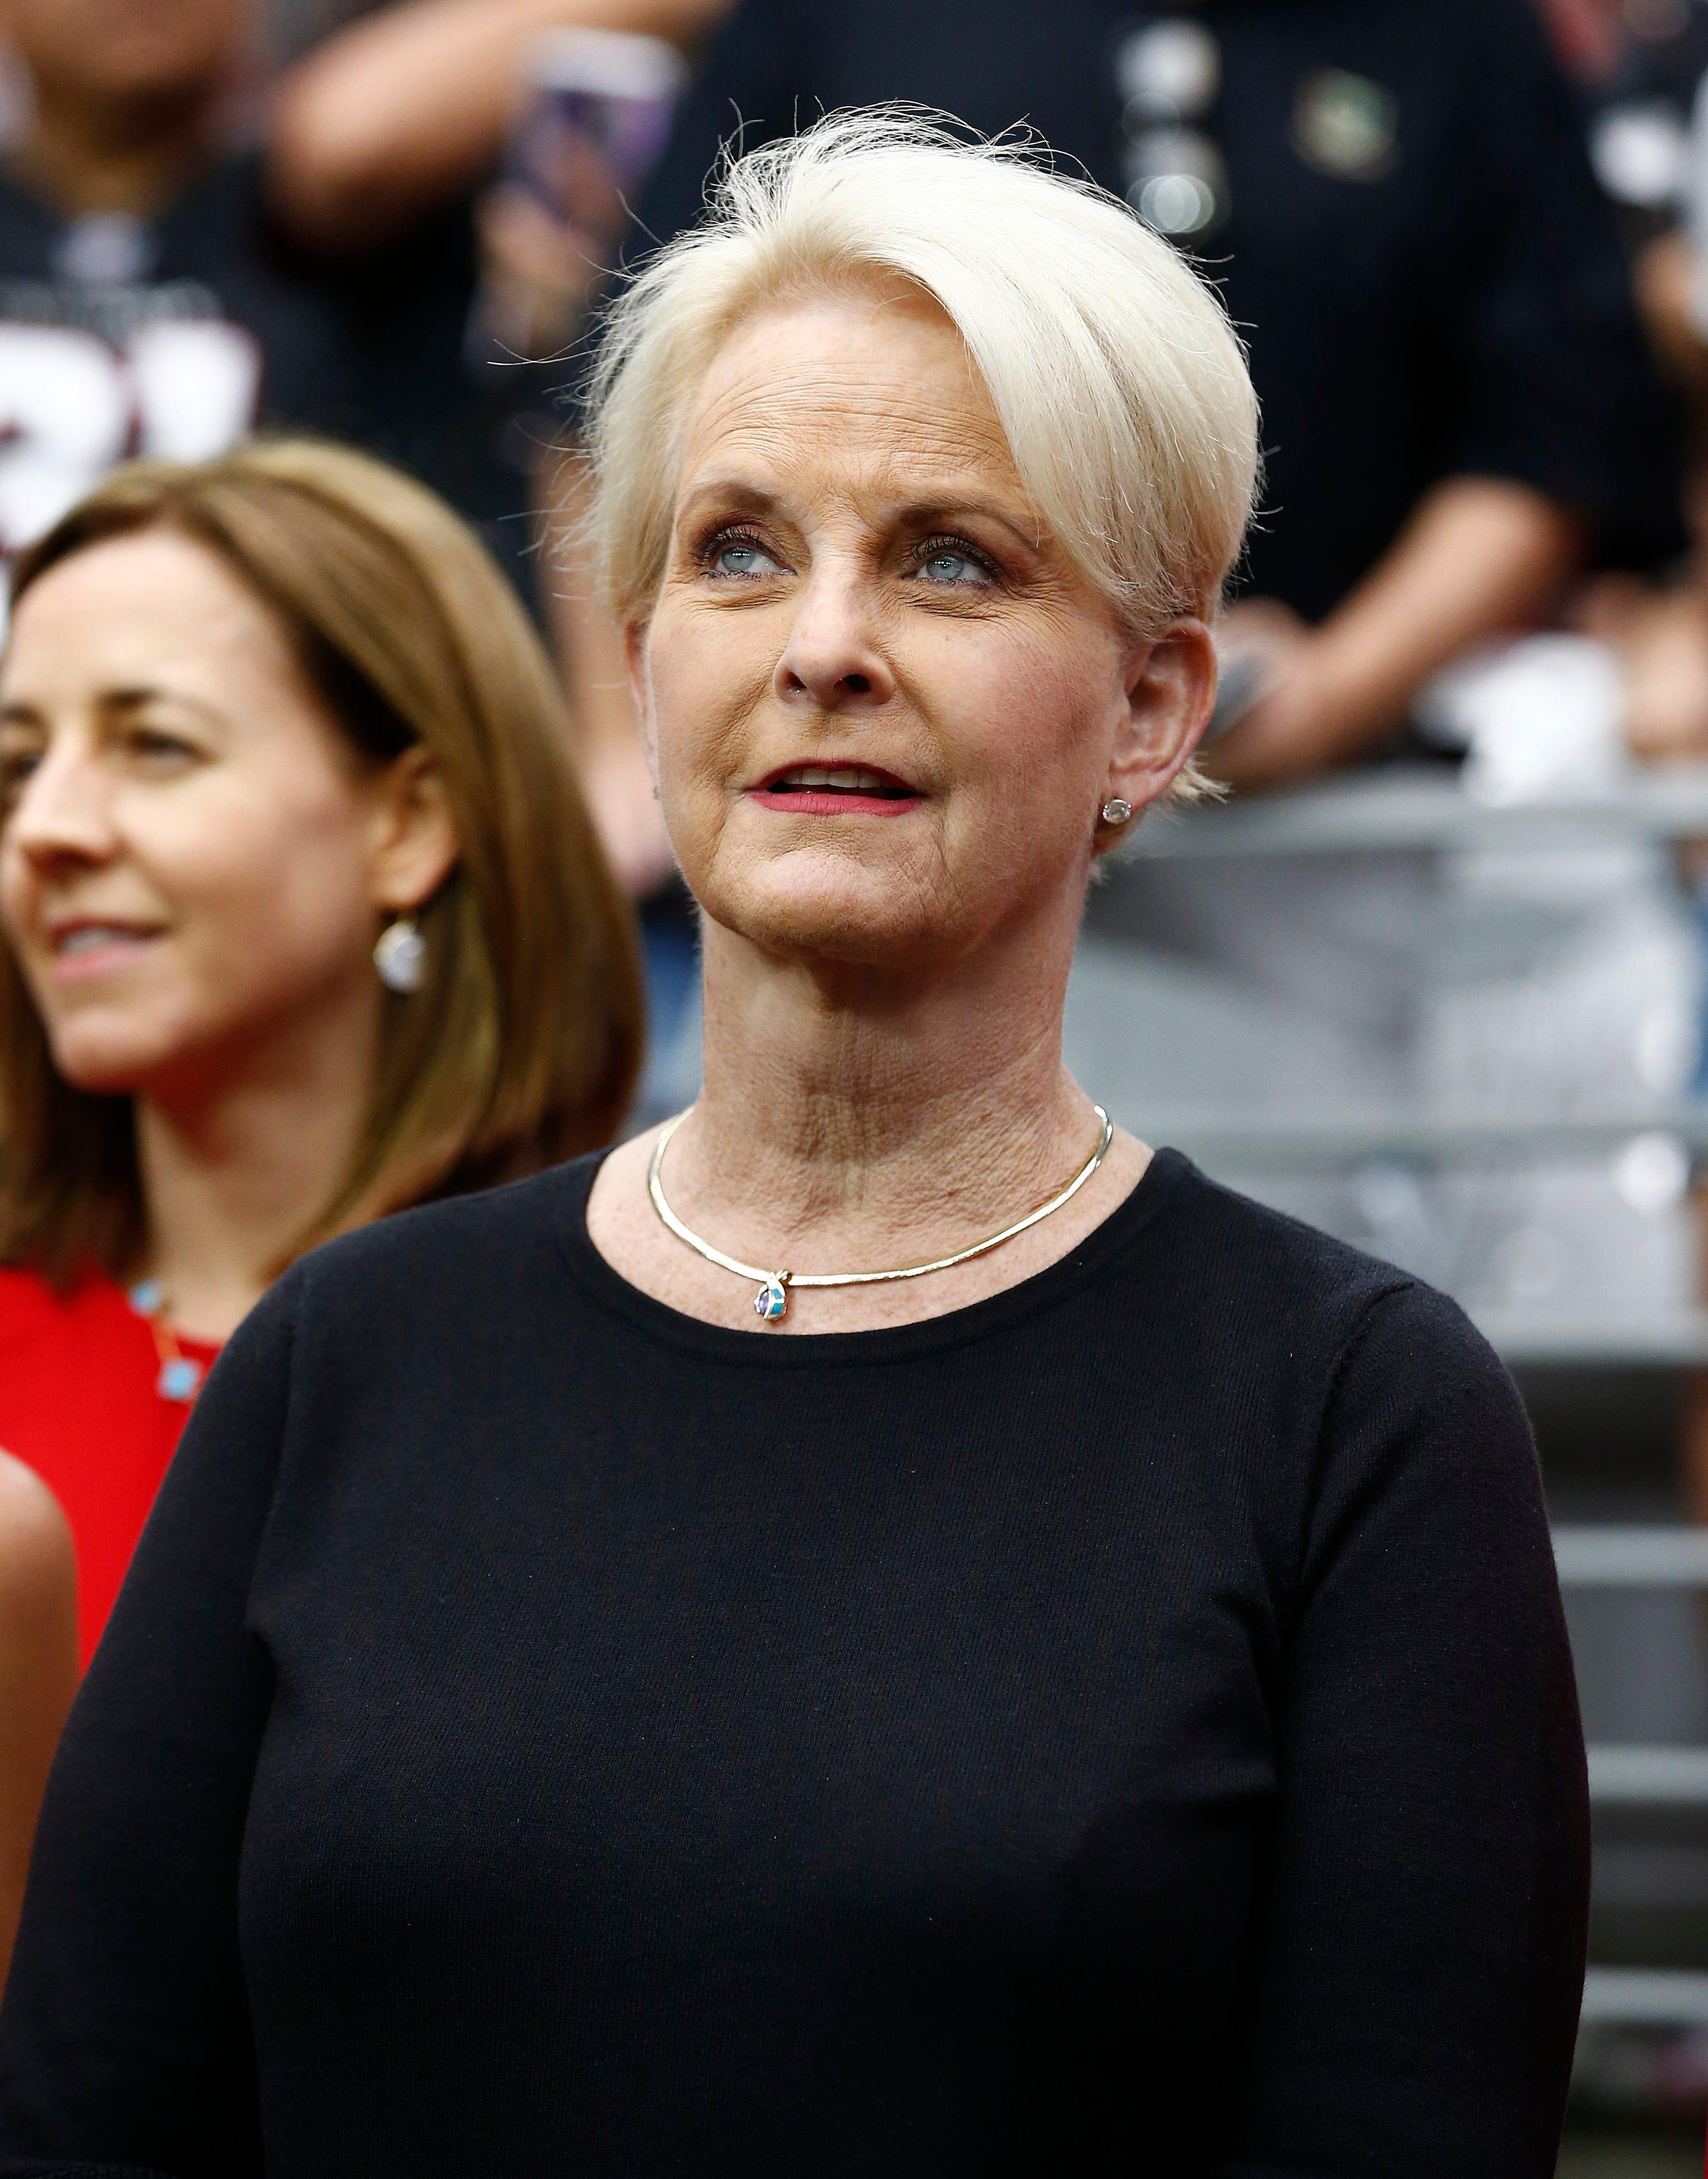 Cindy McCain tweets aggressive message she received about Sen. John McCain, Meghan McCain